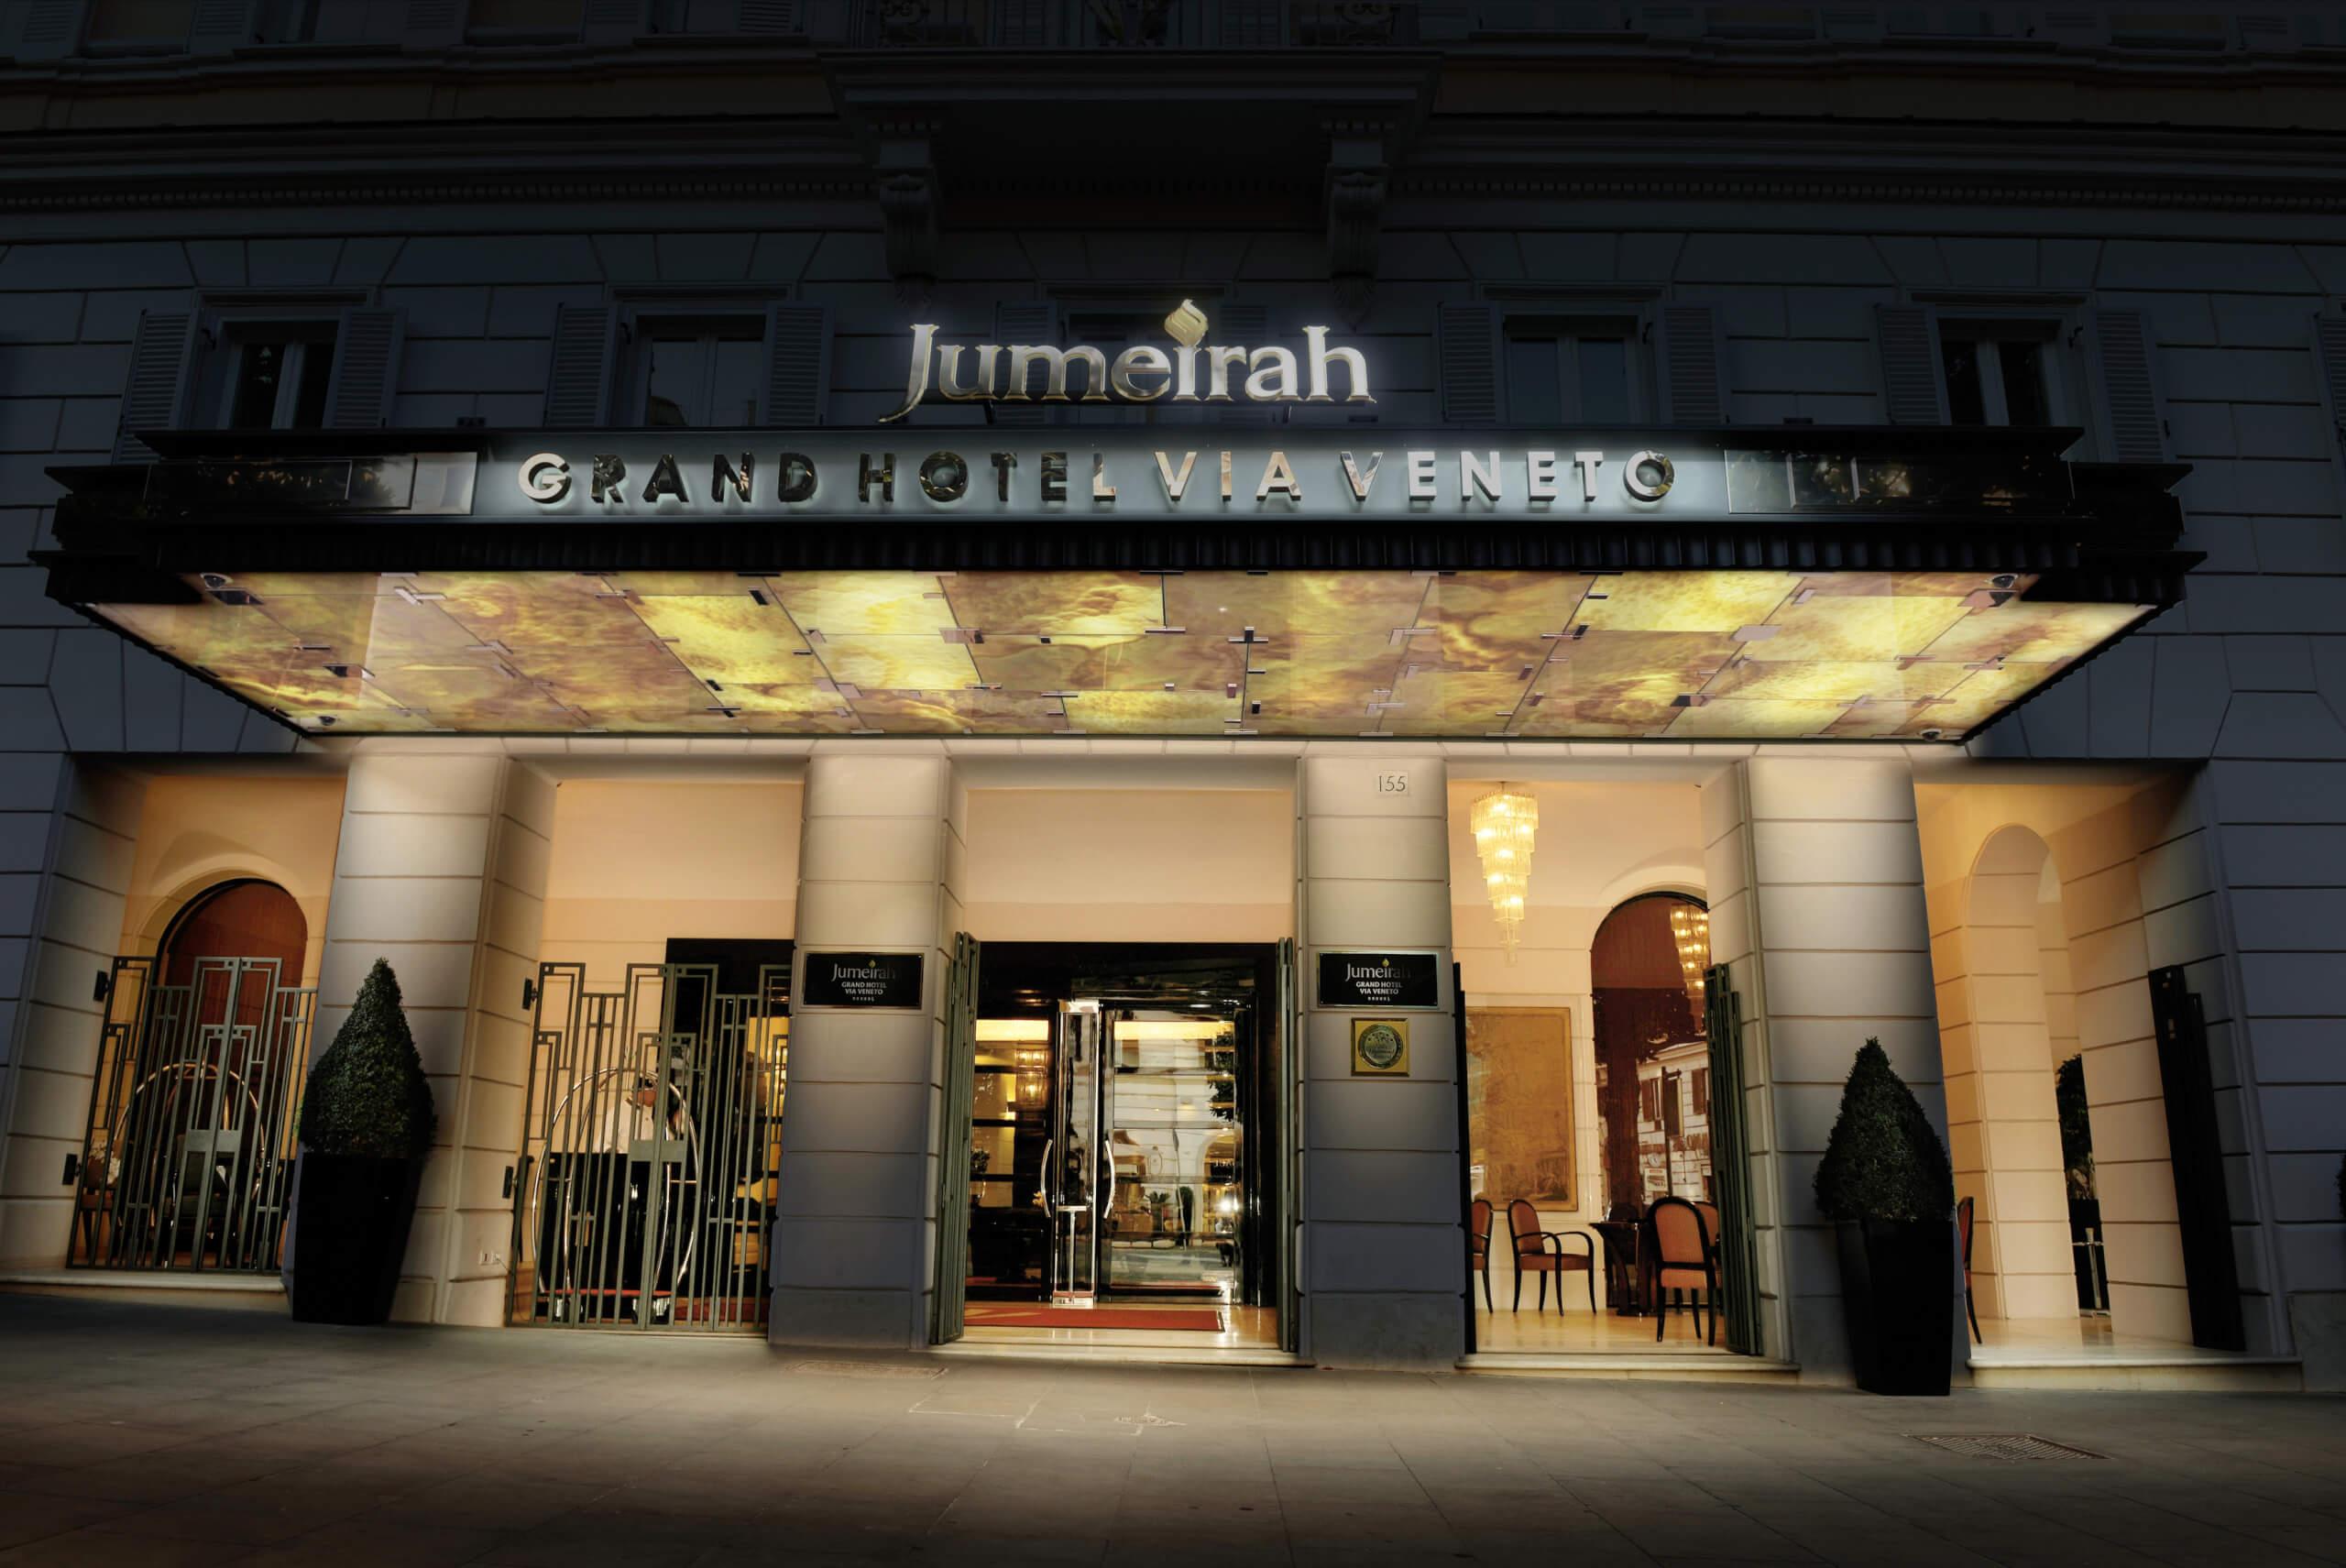 Jumeirah_Grand_Hotel_Via_Veneto_-_The_Entrance_Night_Shot